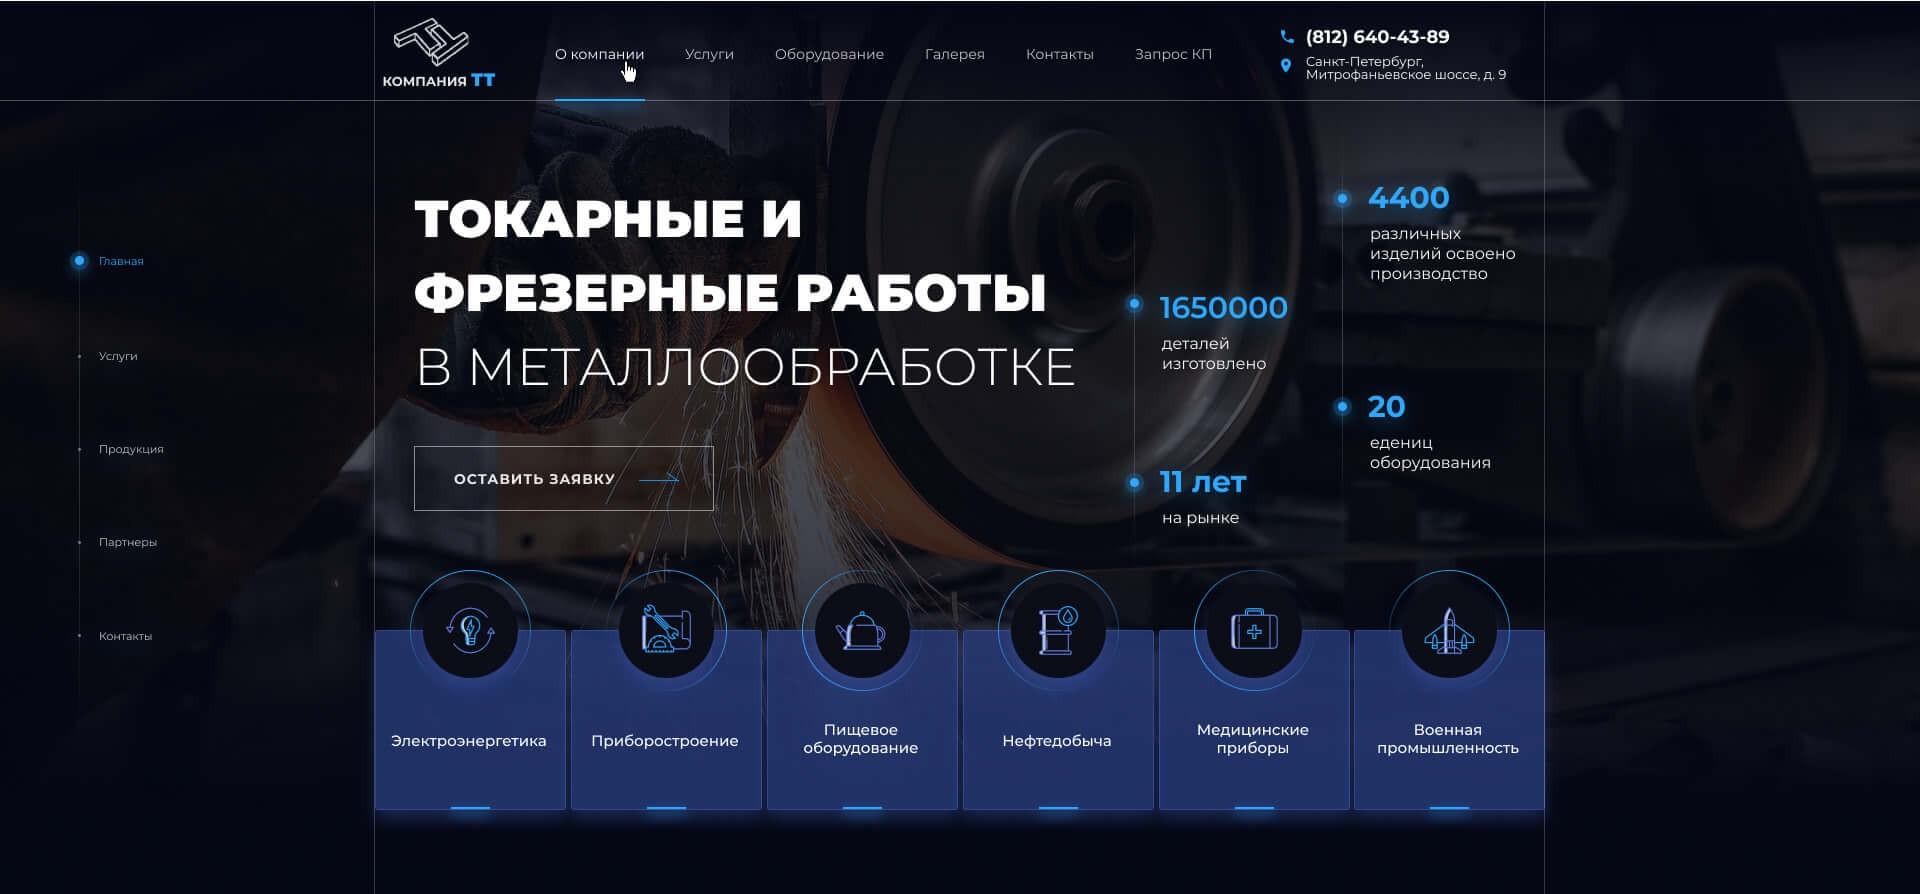 01_TokarnyyeTekhnologii_Home page(1)